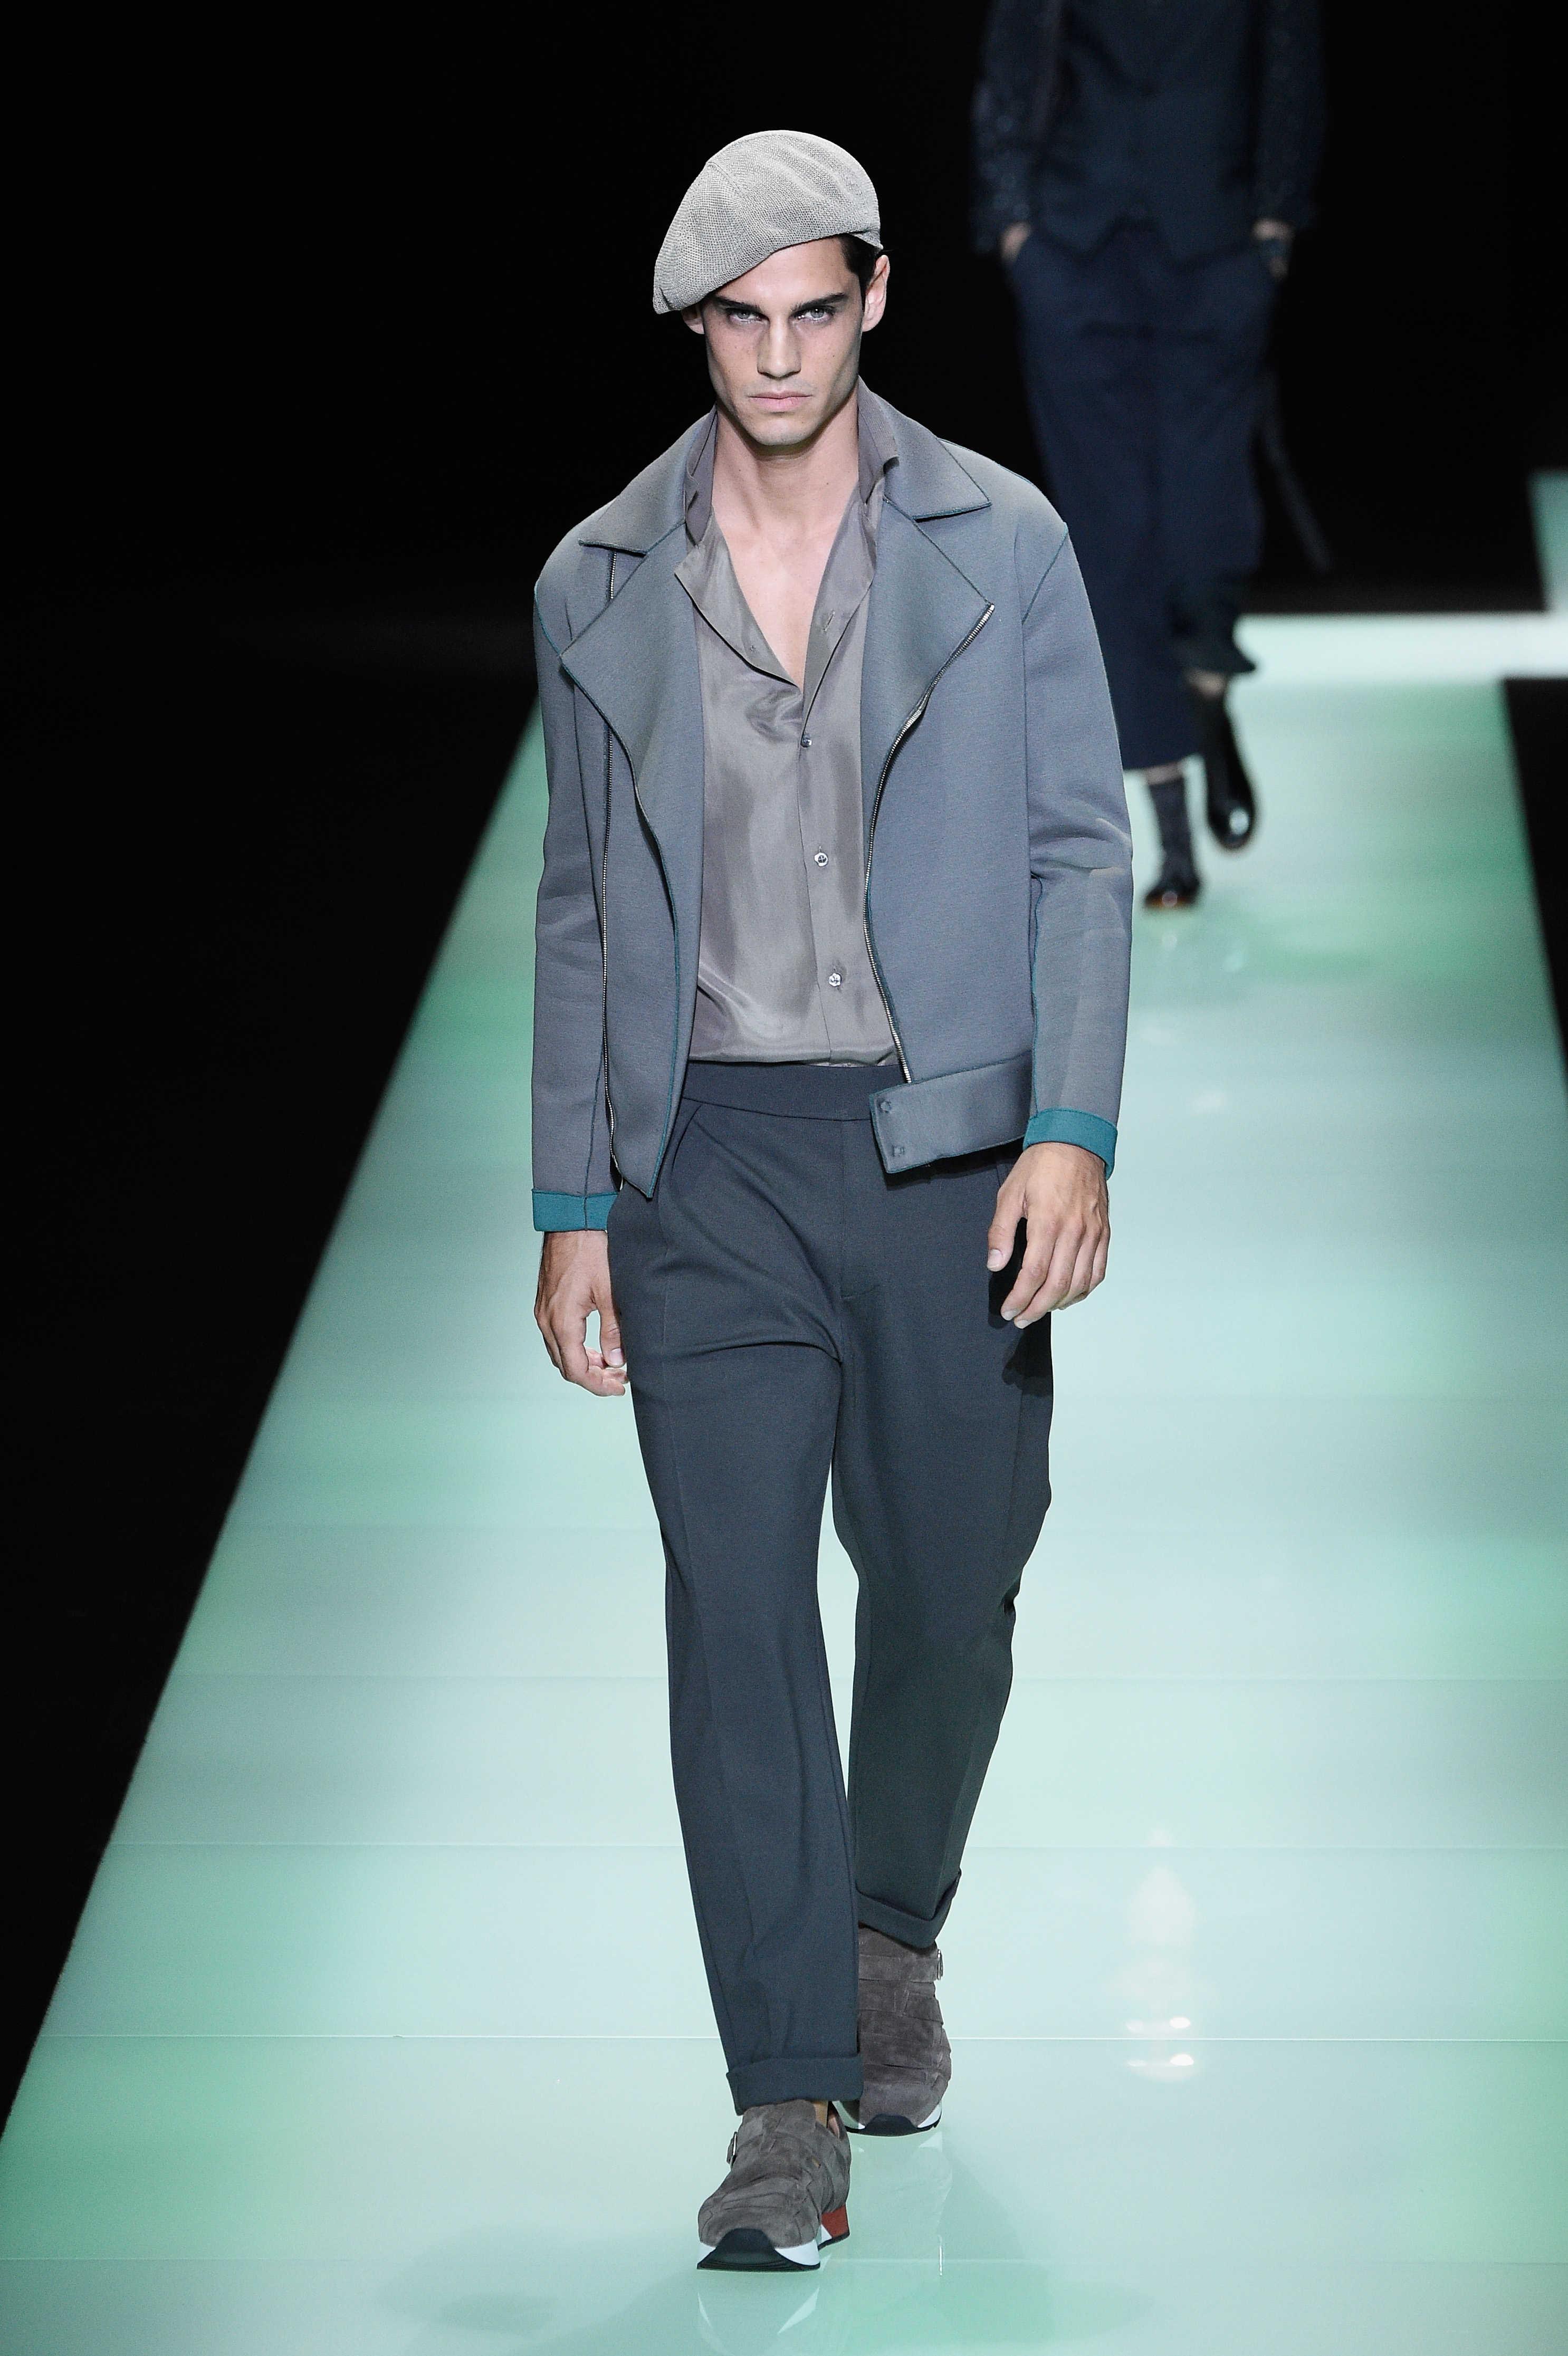 9a95540351f Emporio Armani Spring Summer 2016 Menswear Collection